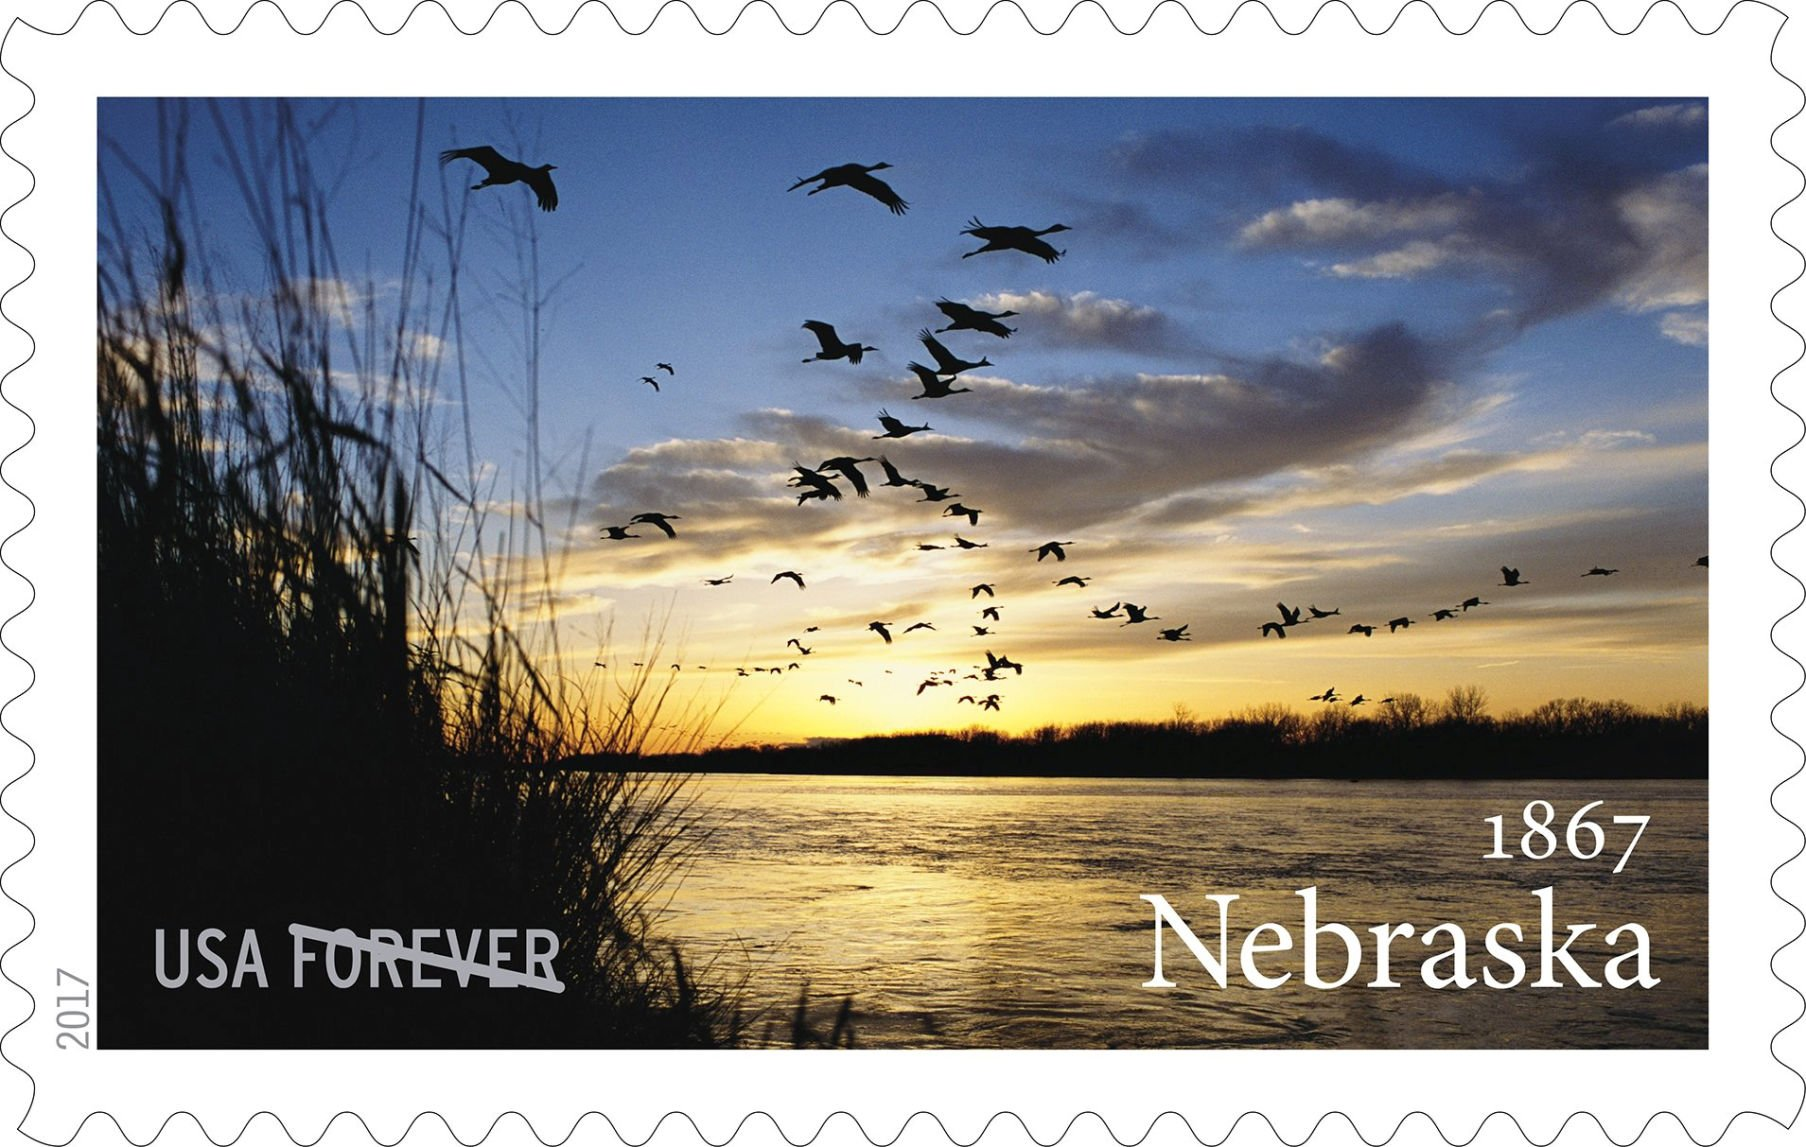 Postal Service introduces Nebraska statehood u0027foreveru0027 stamp